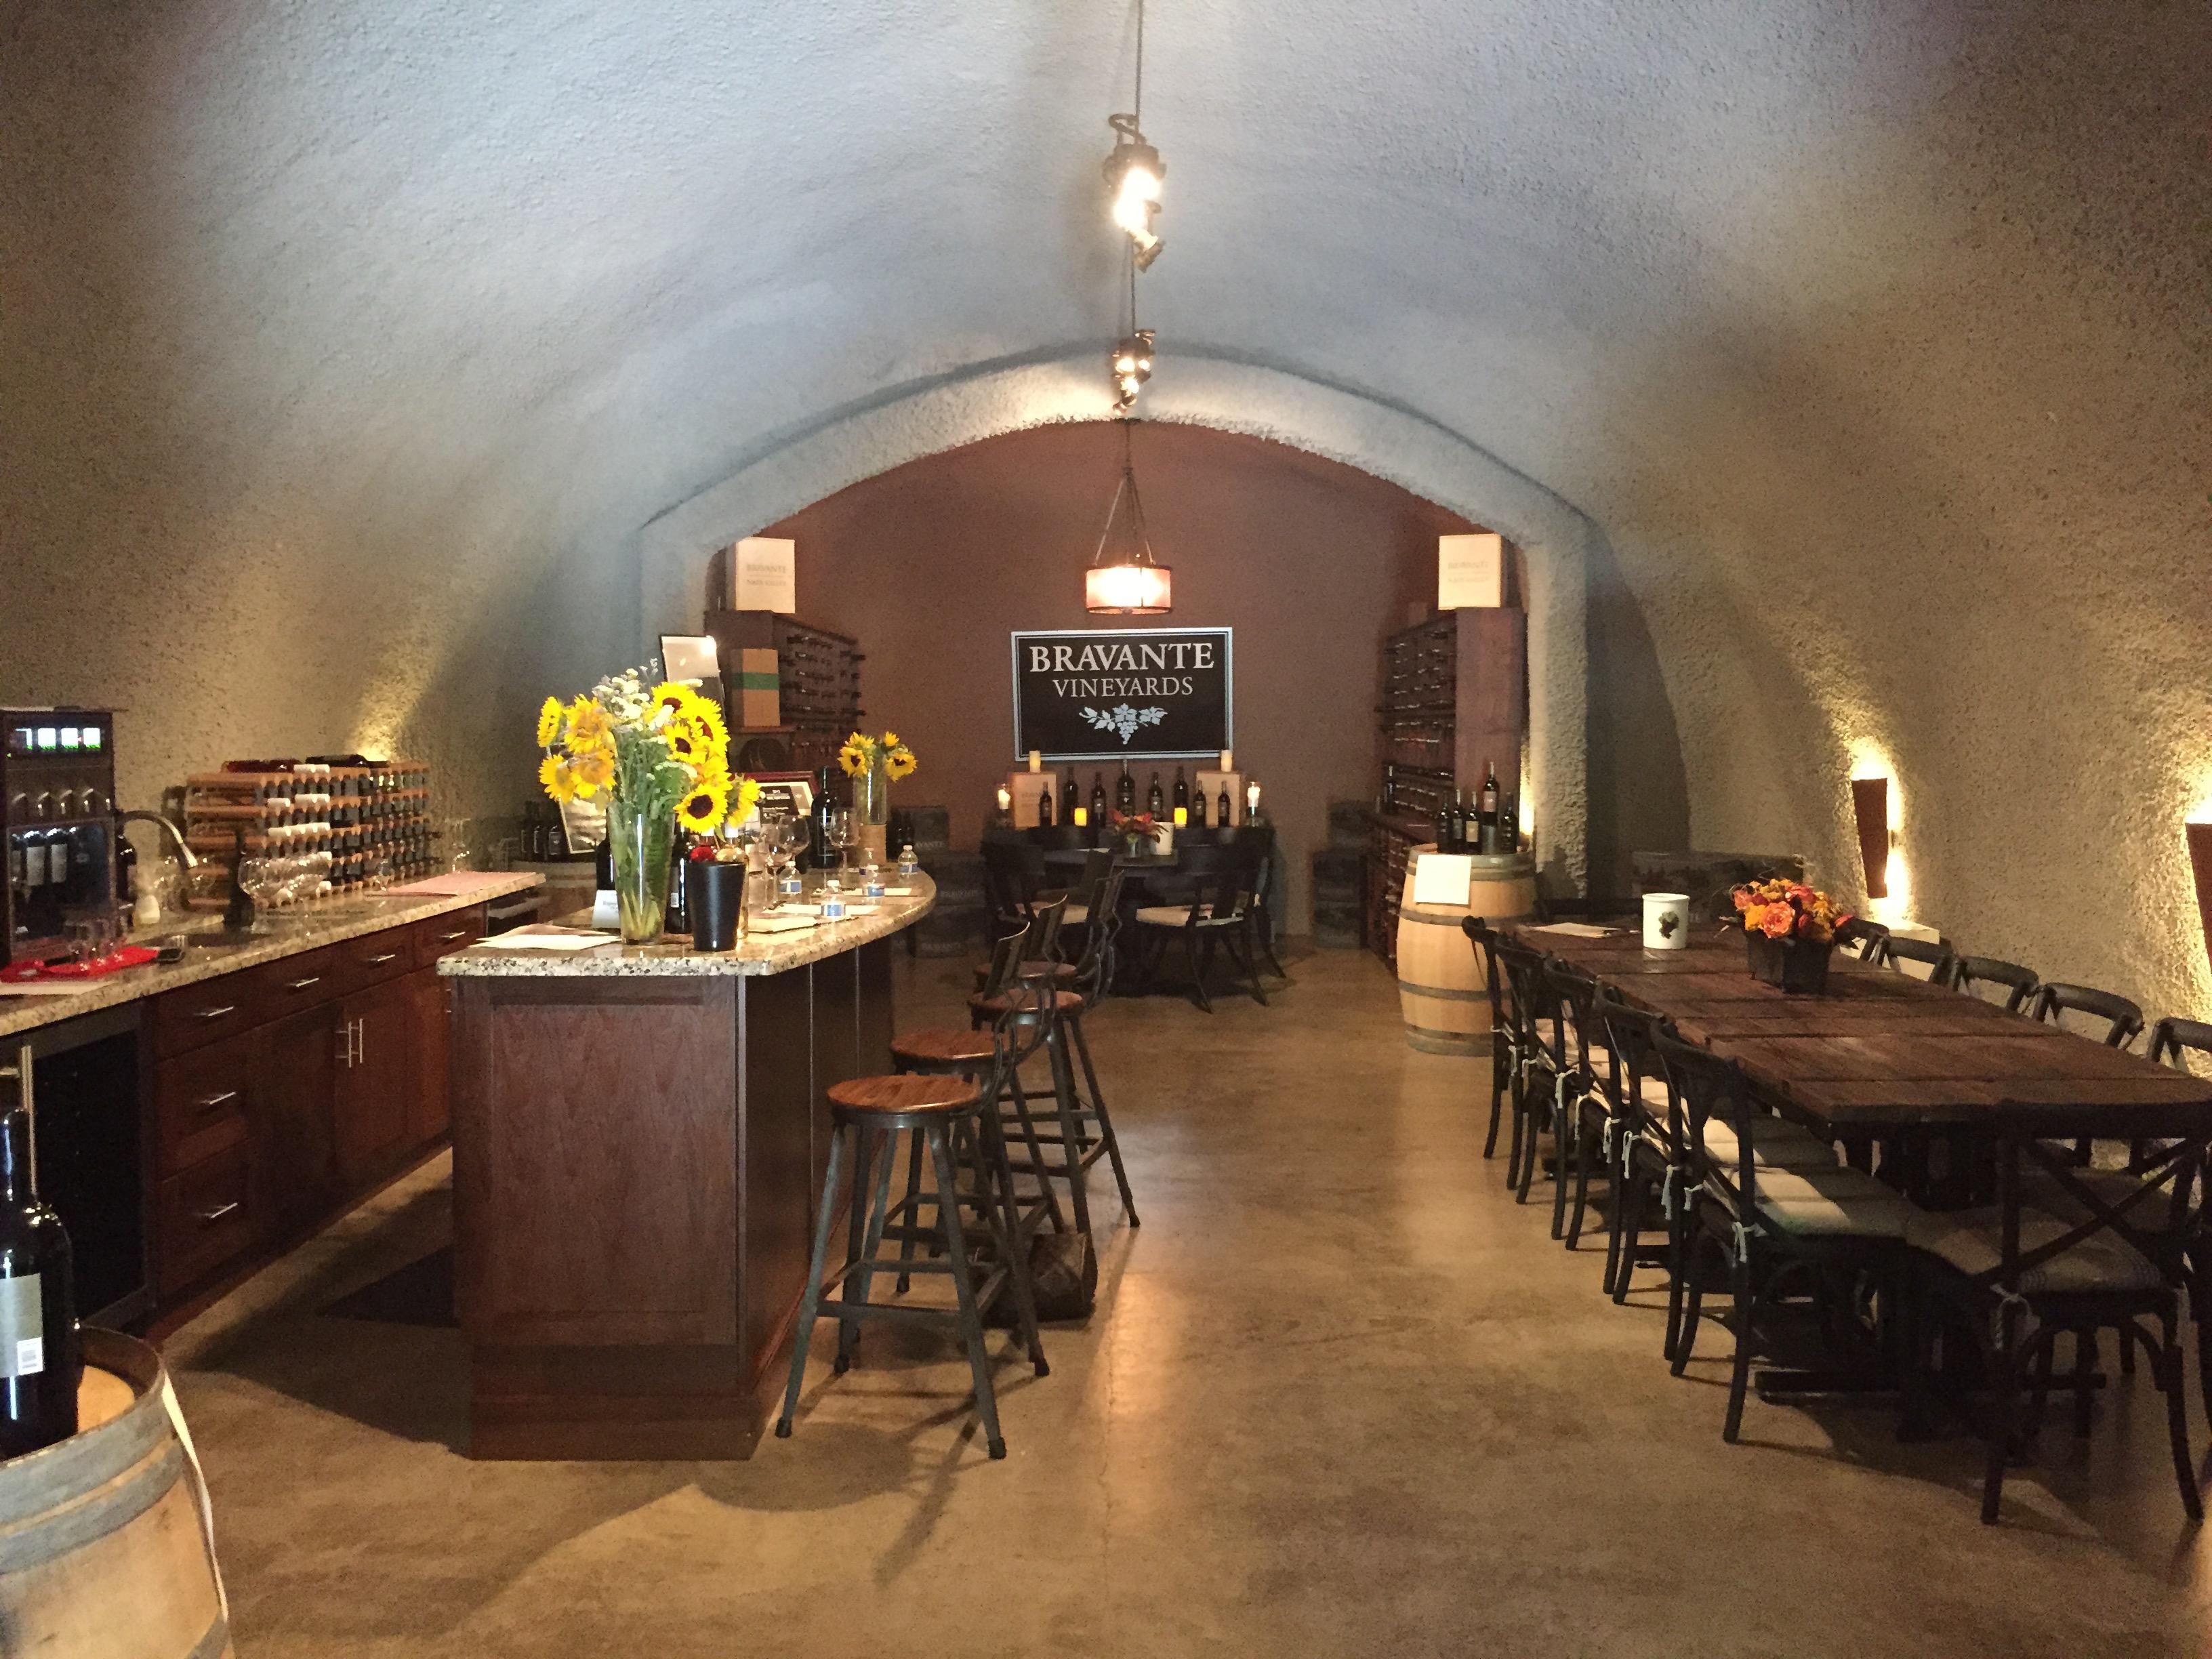 Bravante Vineyards Wine Tasting Tour